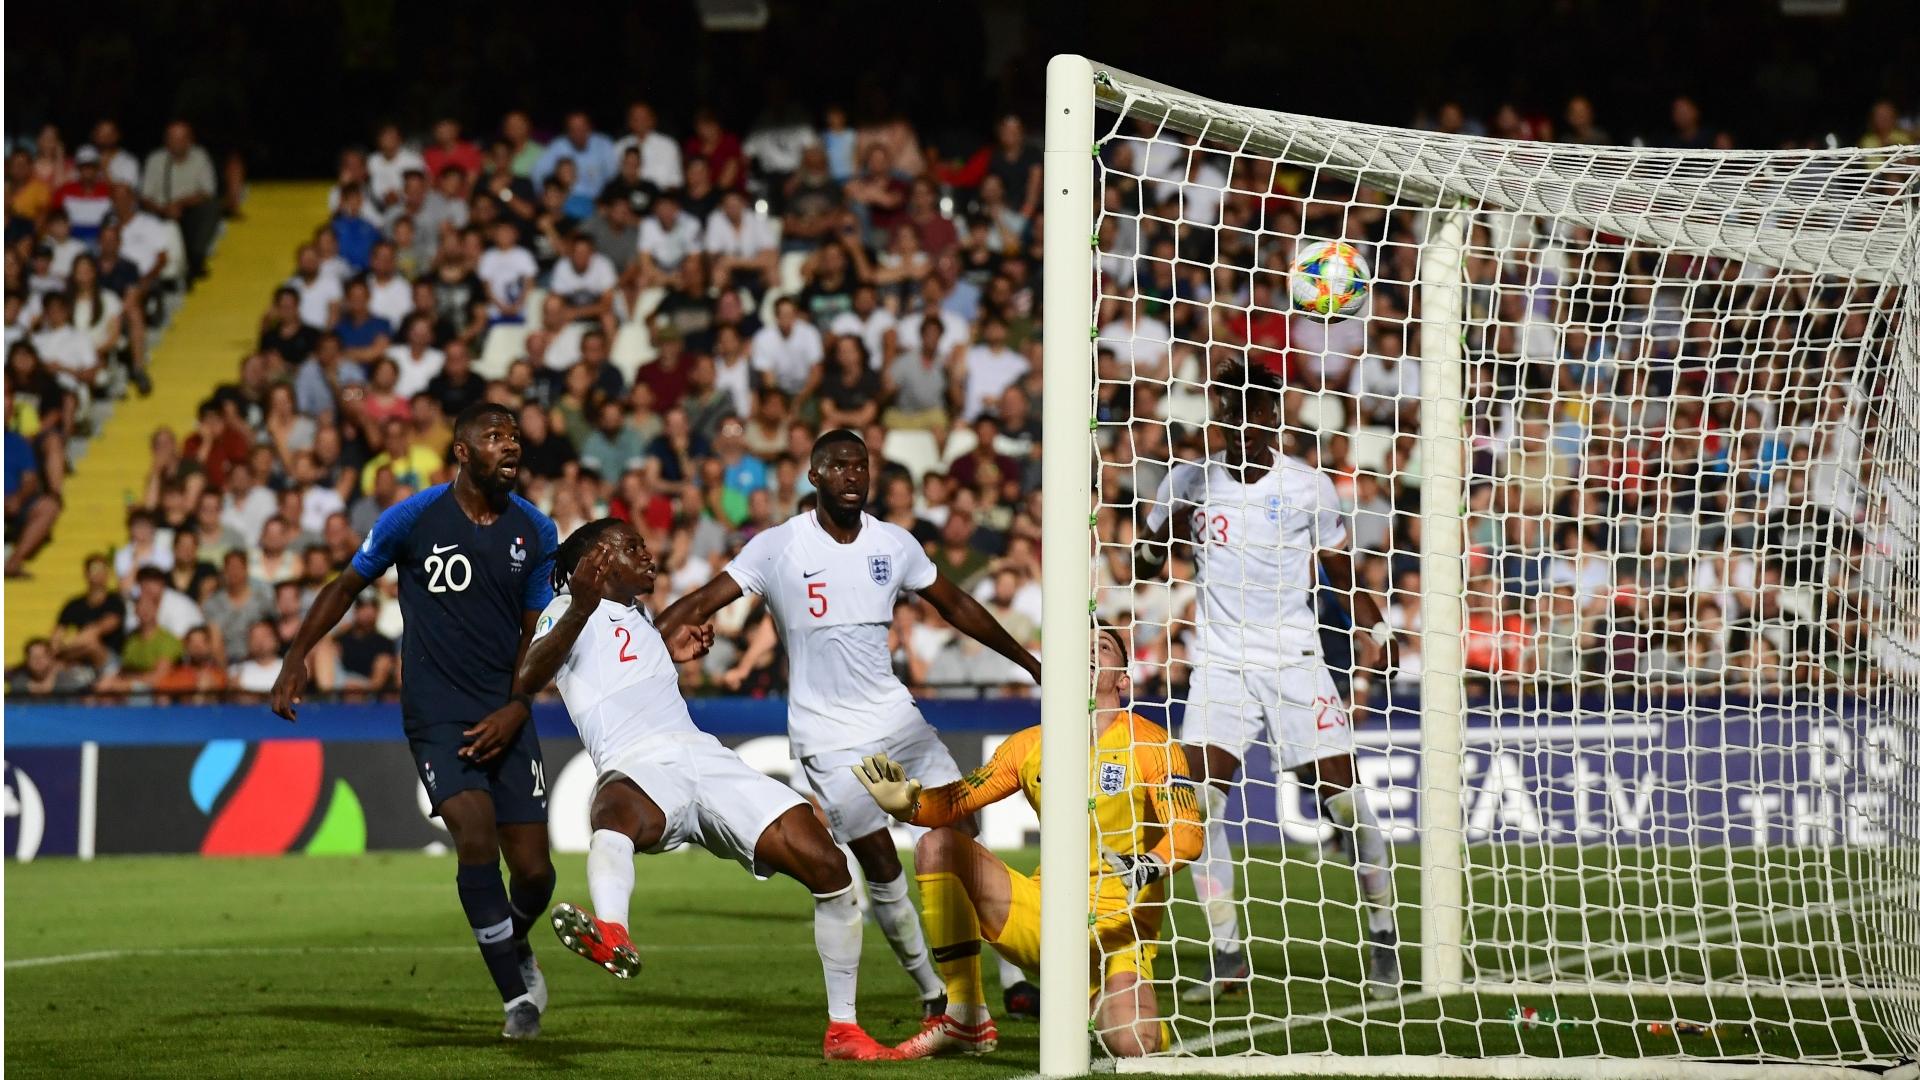 Wan-Bissaka, England U21